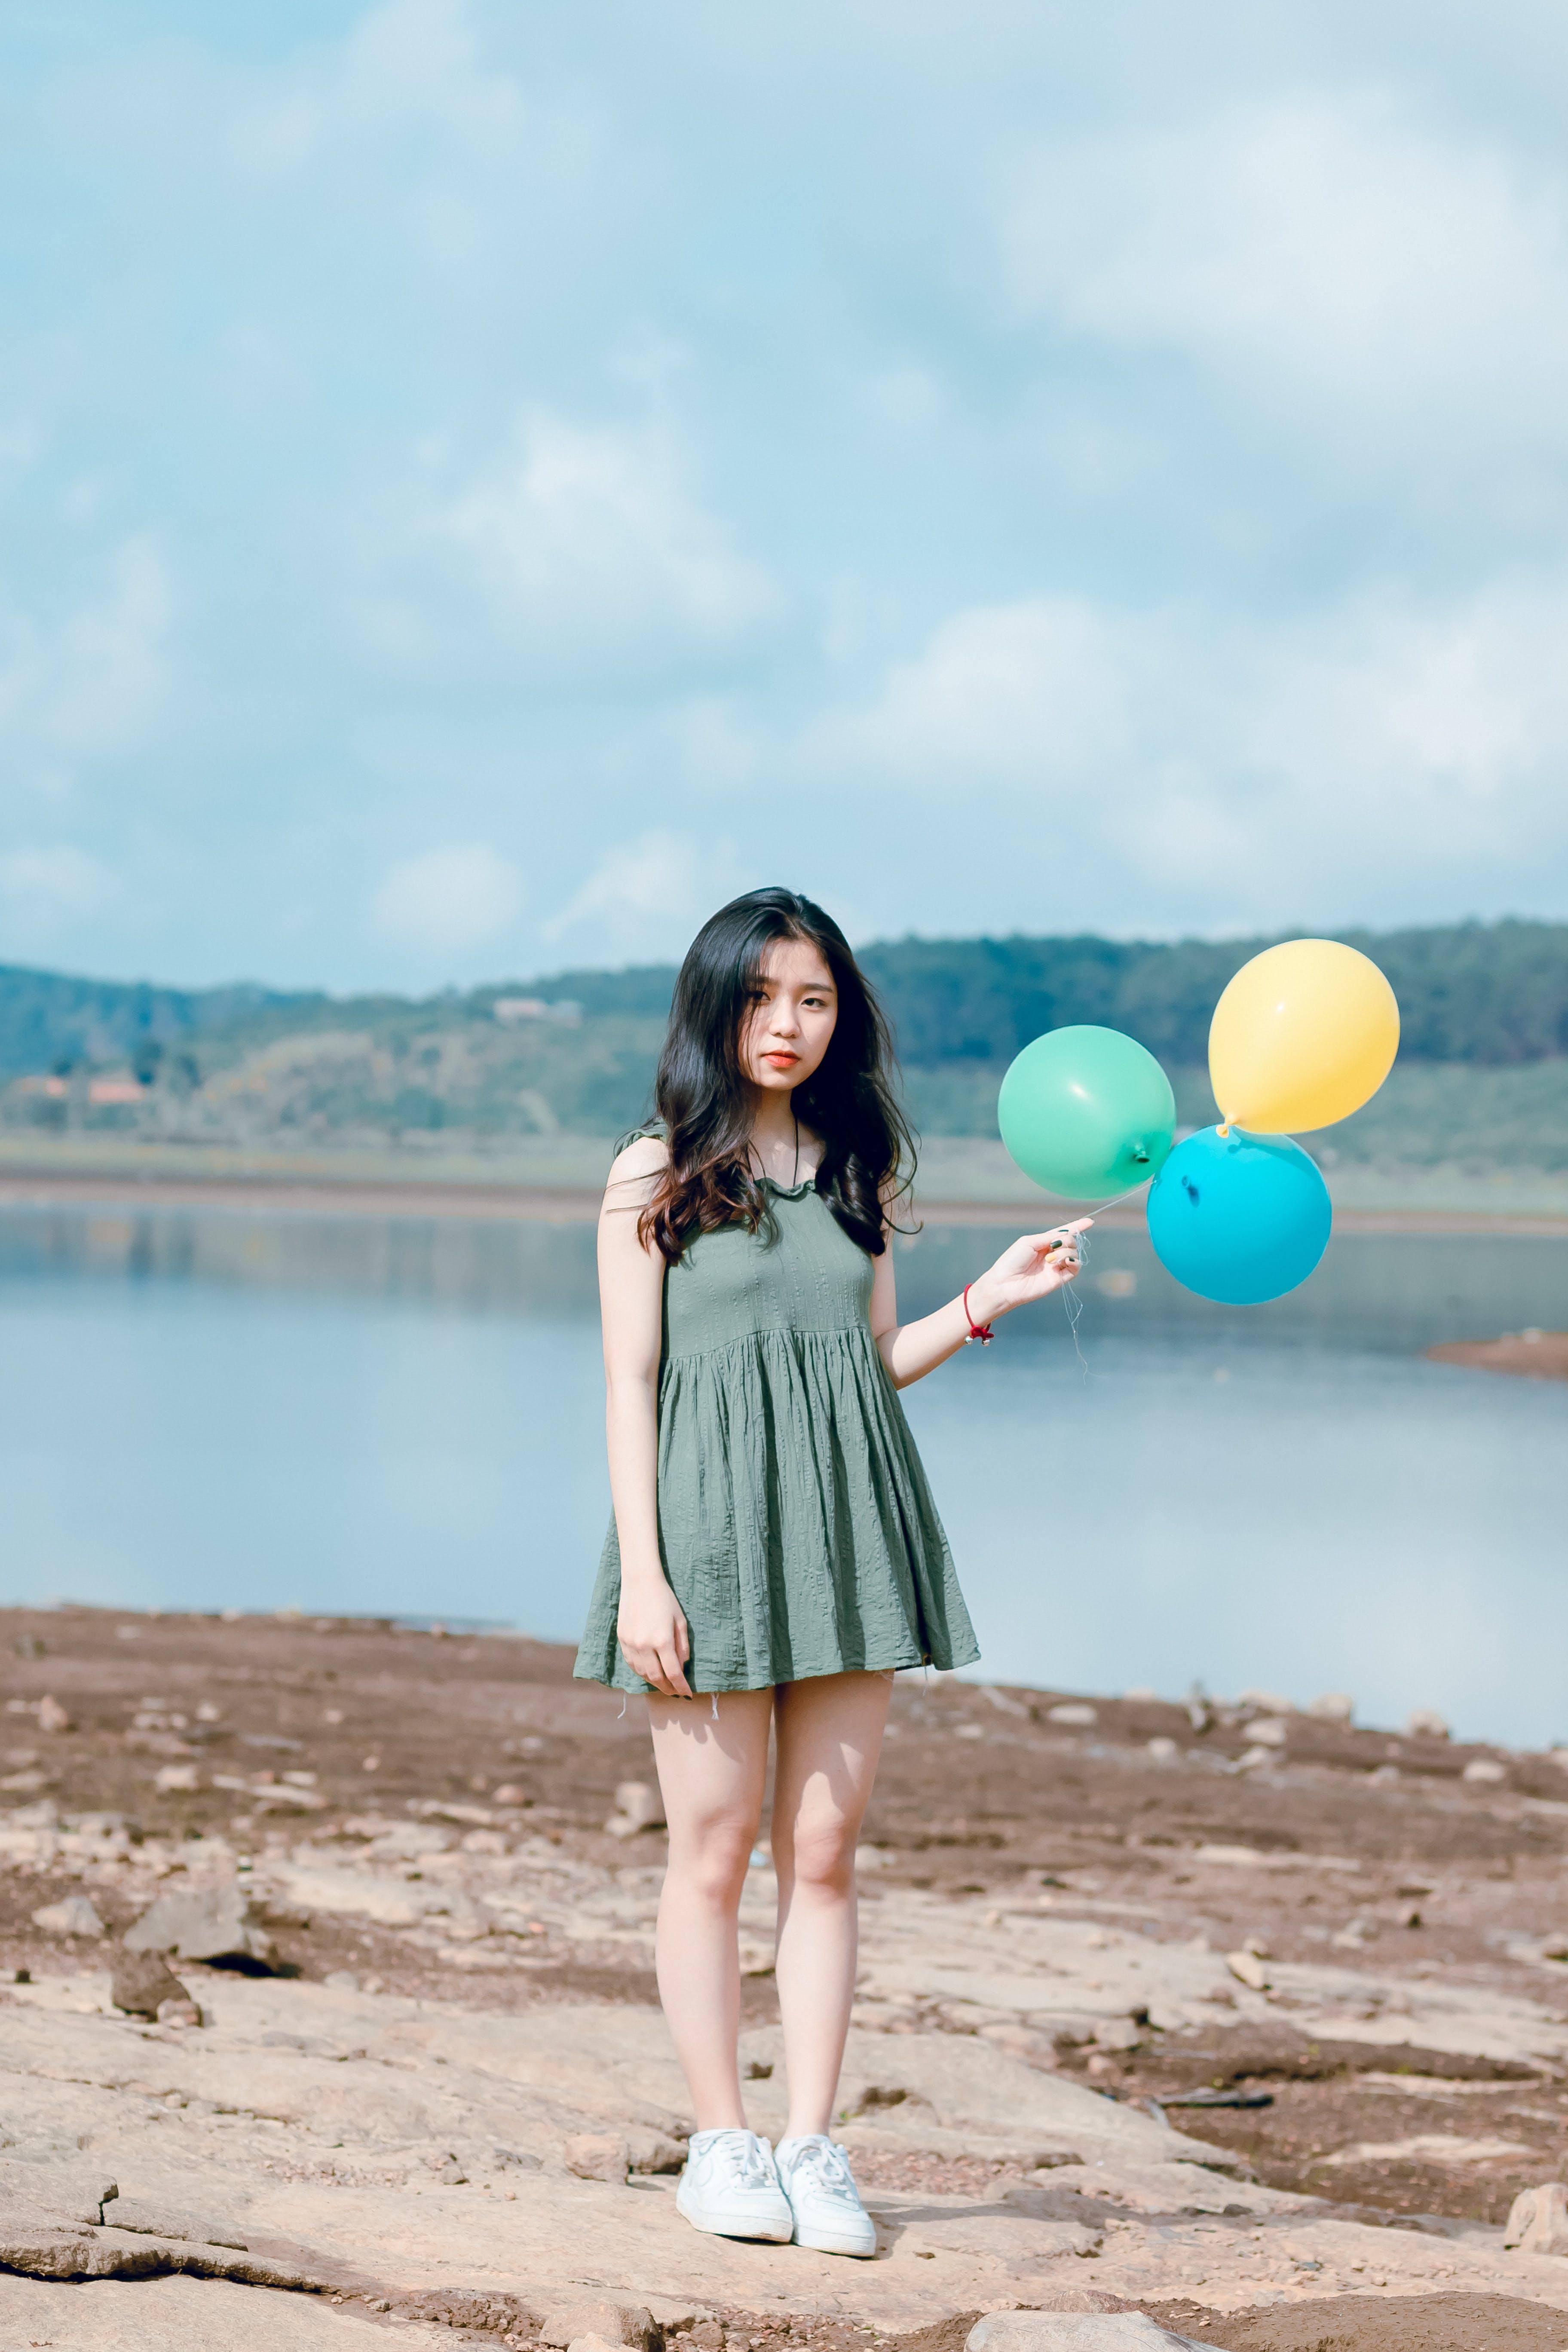 Photo of Girl Wearing Green Mini Dress Holding Balloons